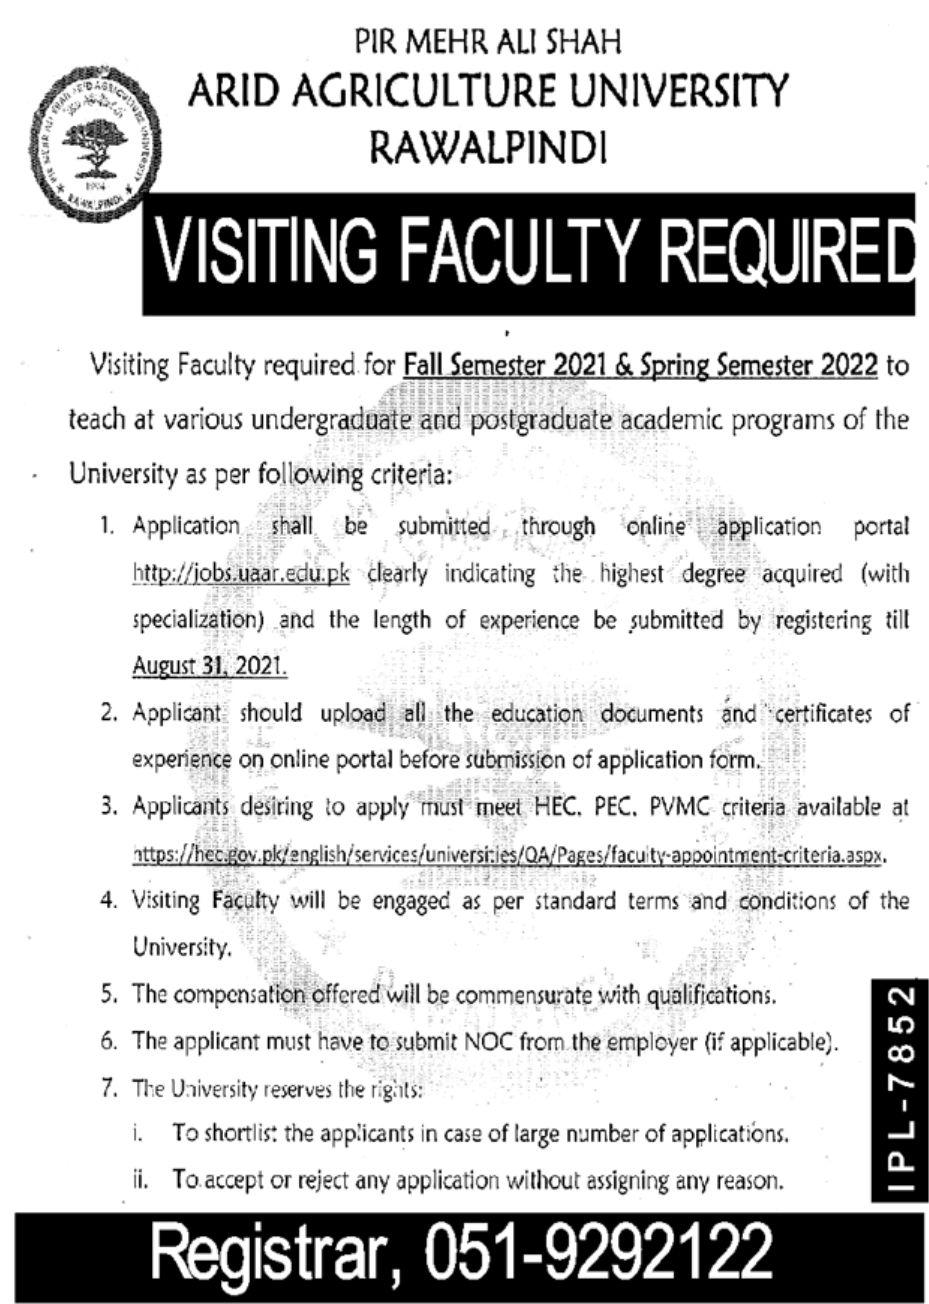 ARID Agriculture University Rawalpindi Vacancies 2021 3